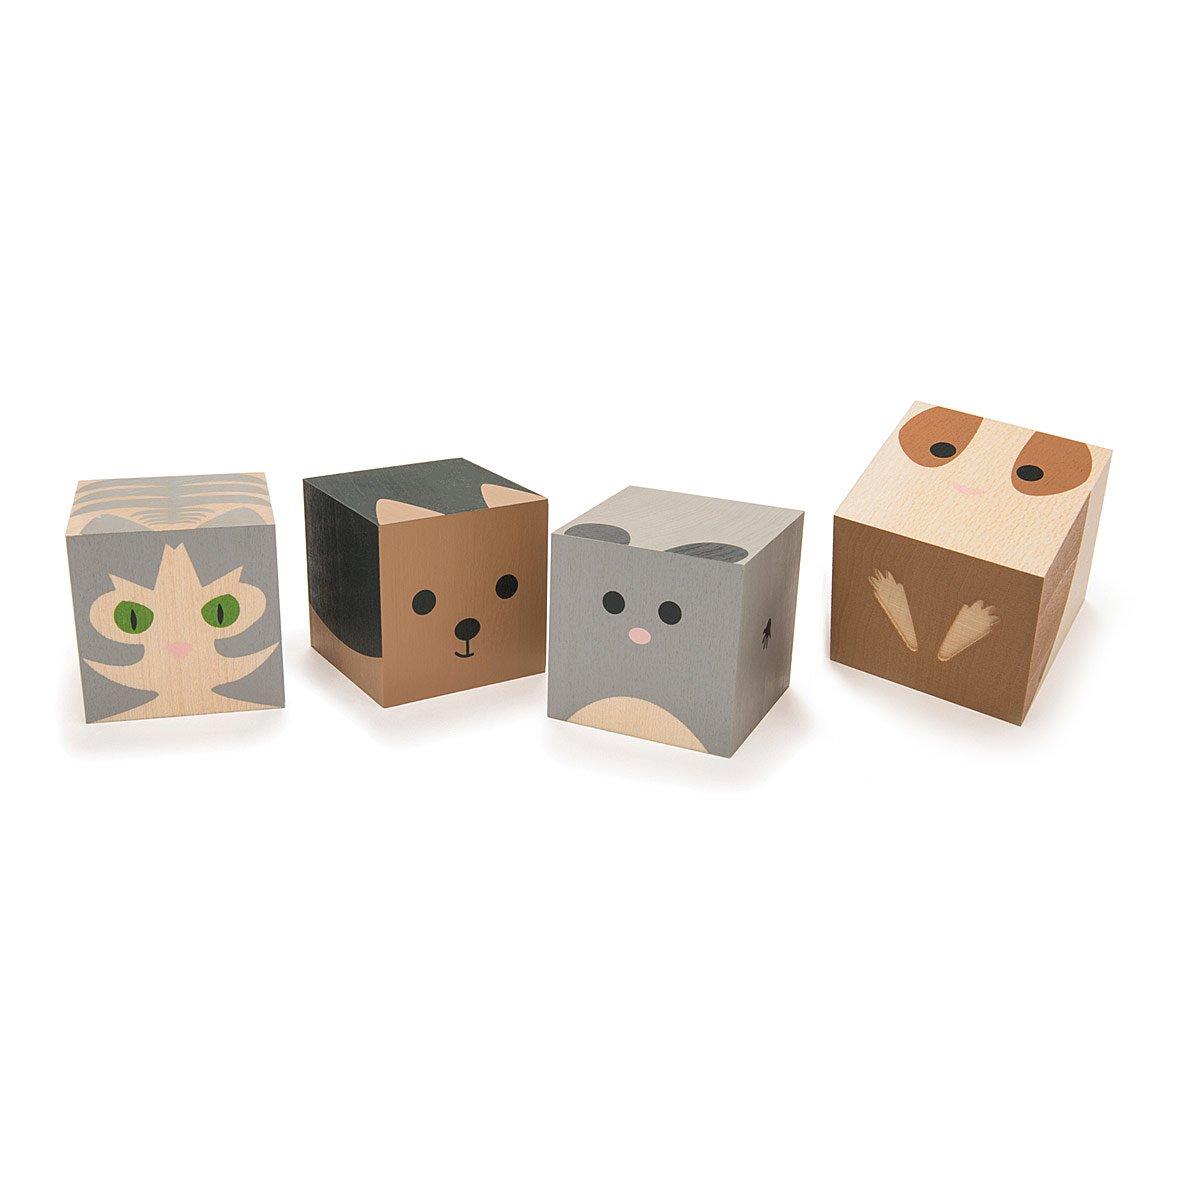 Periodic table building blocks toy blocks element blocks house pet blocks urtaz Gallery